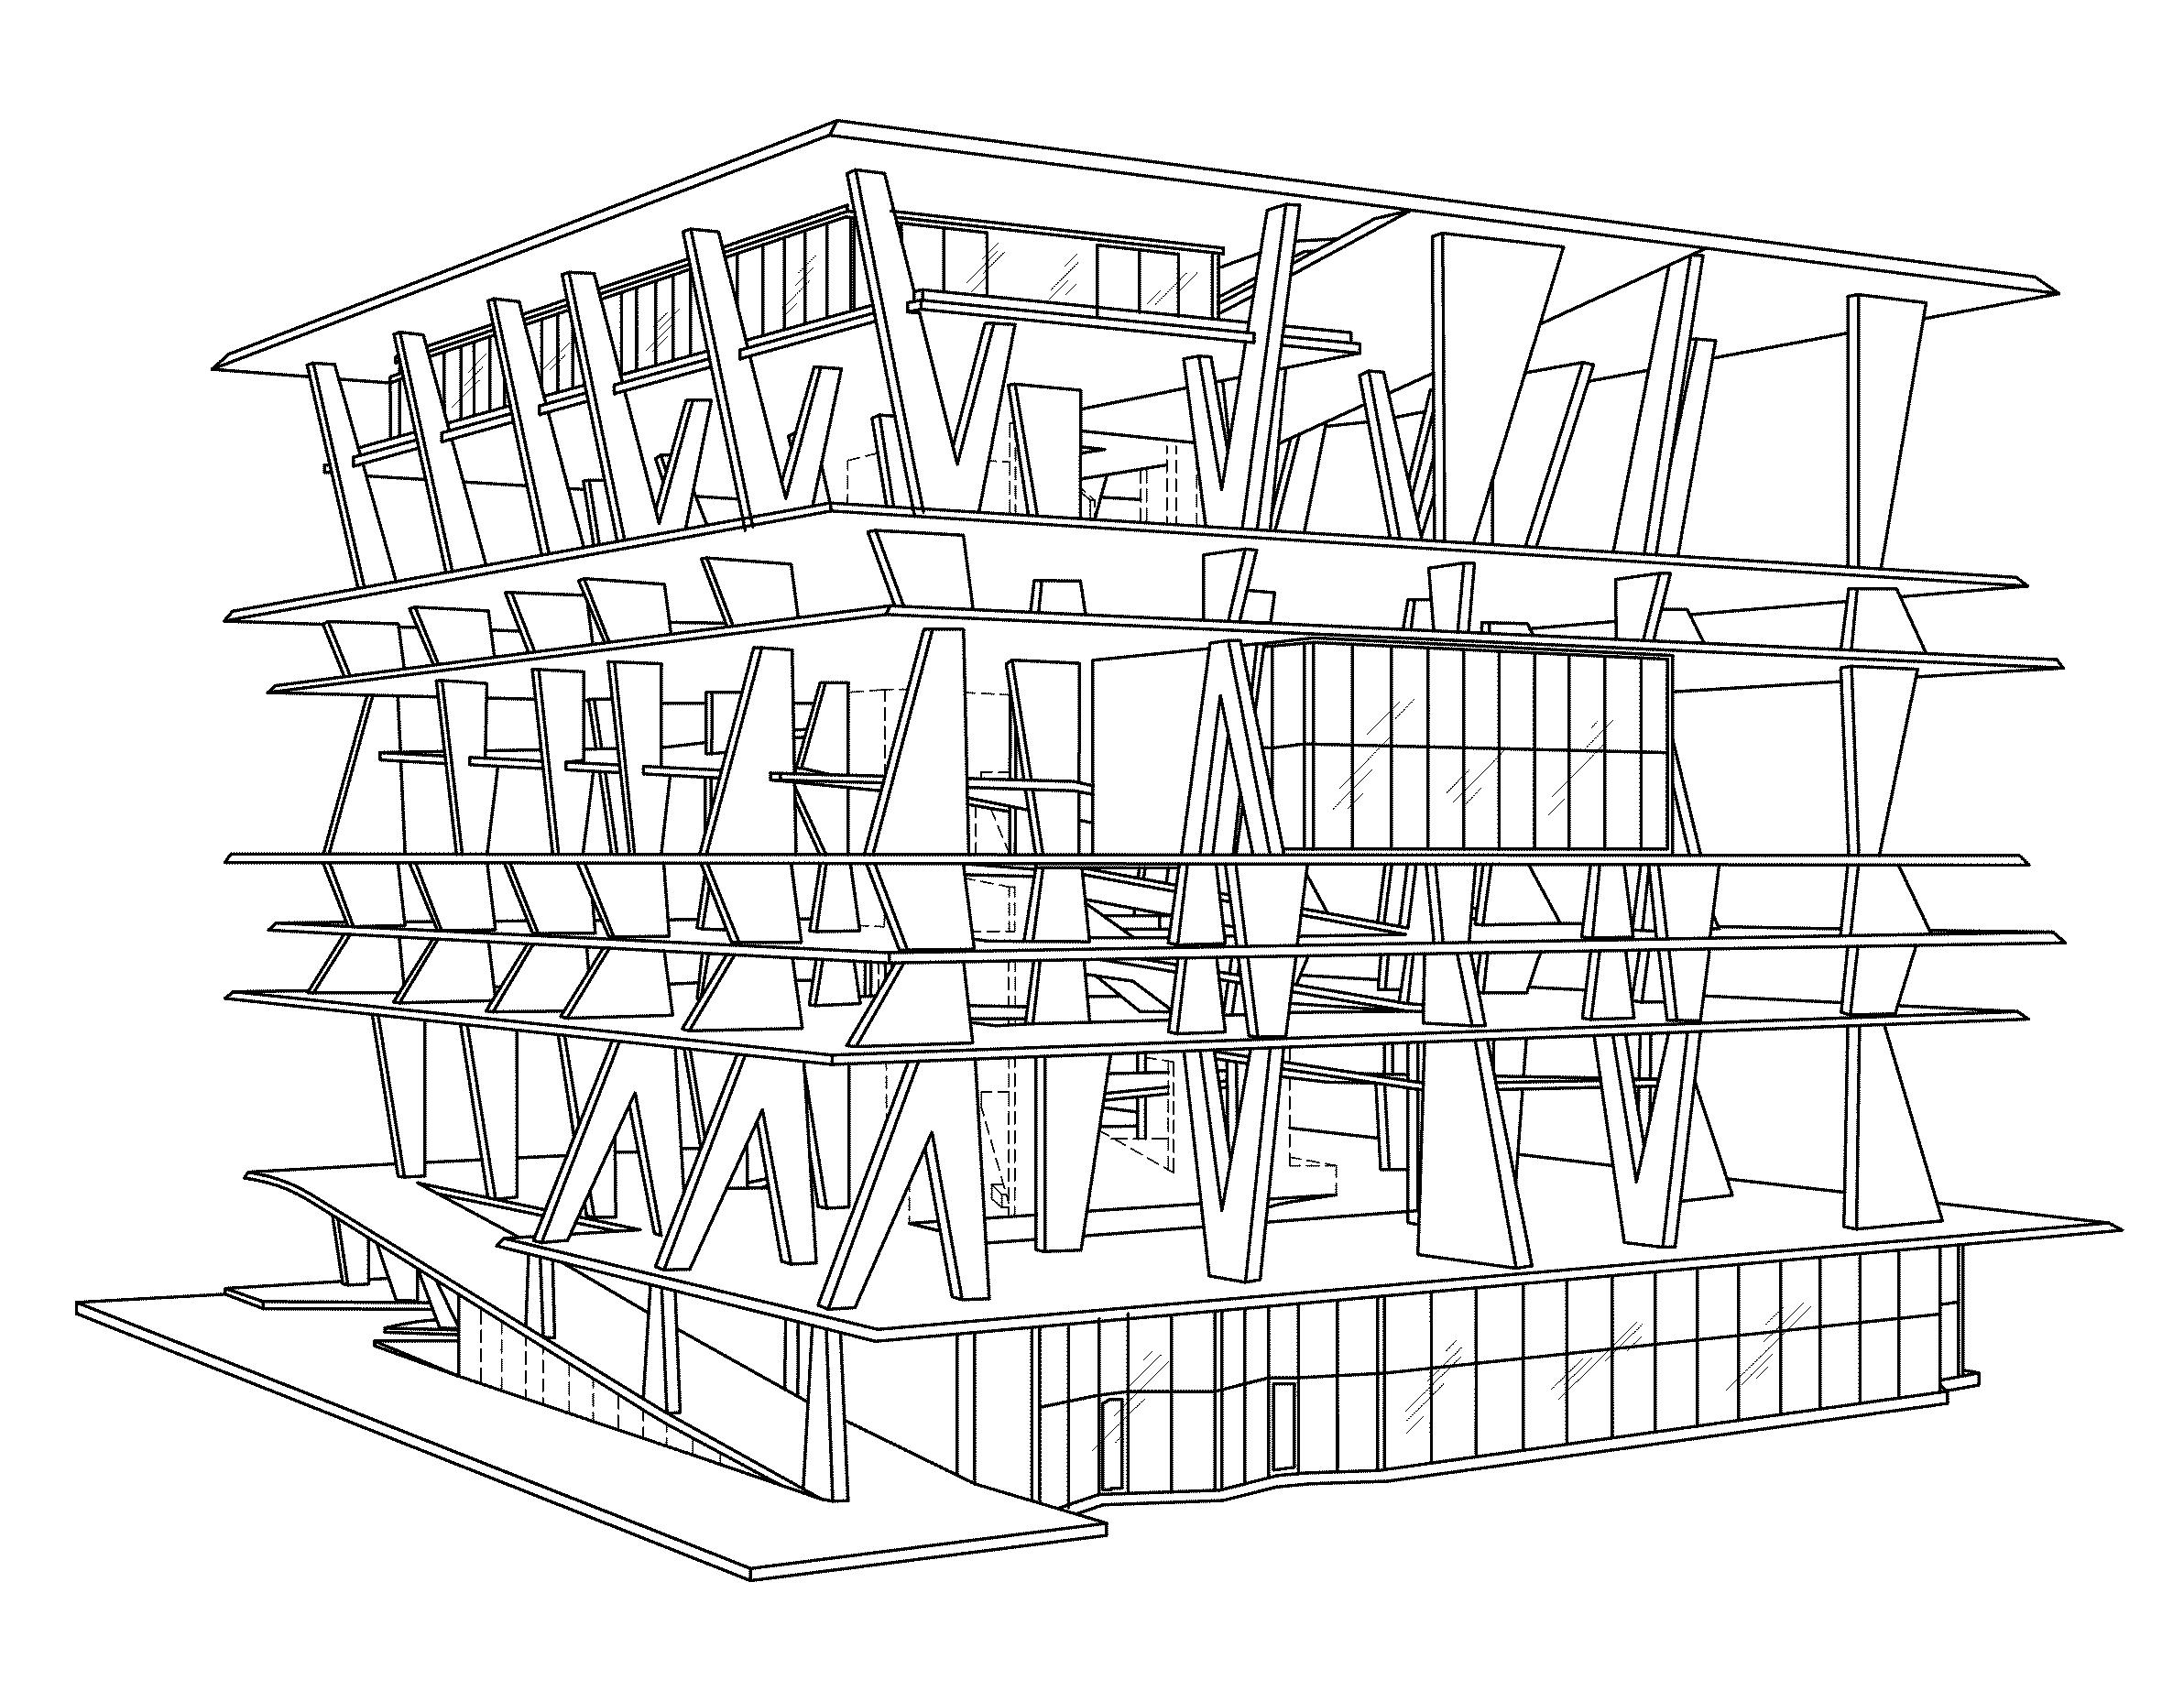 1111 Lincoln Road Drawings Herzog De Meuron 08 Wikiarquitectura